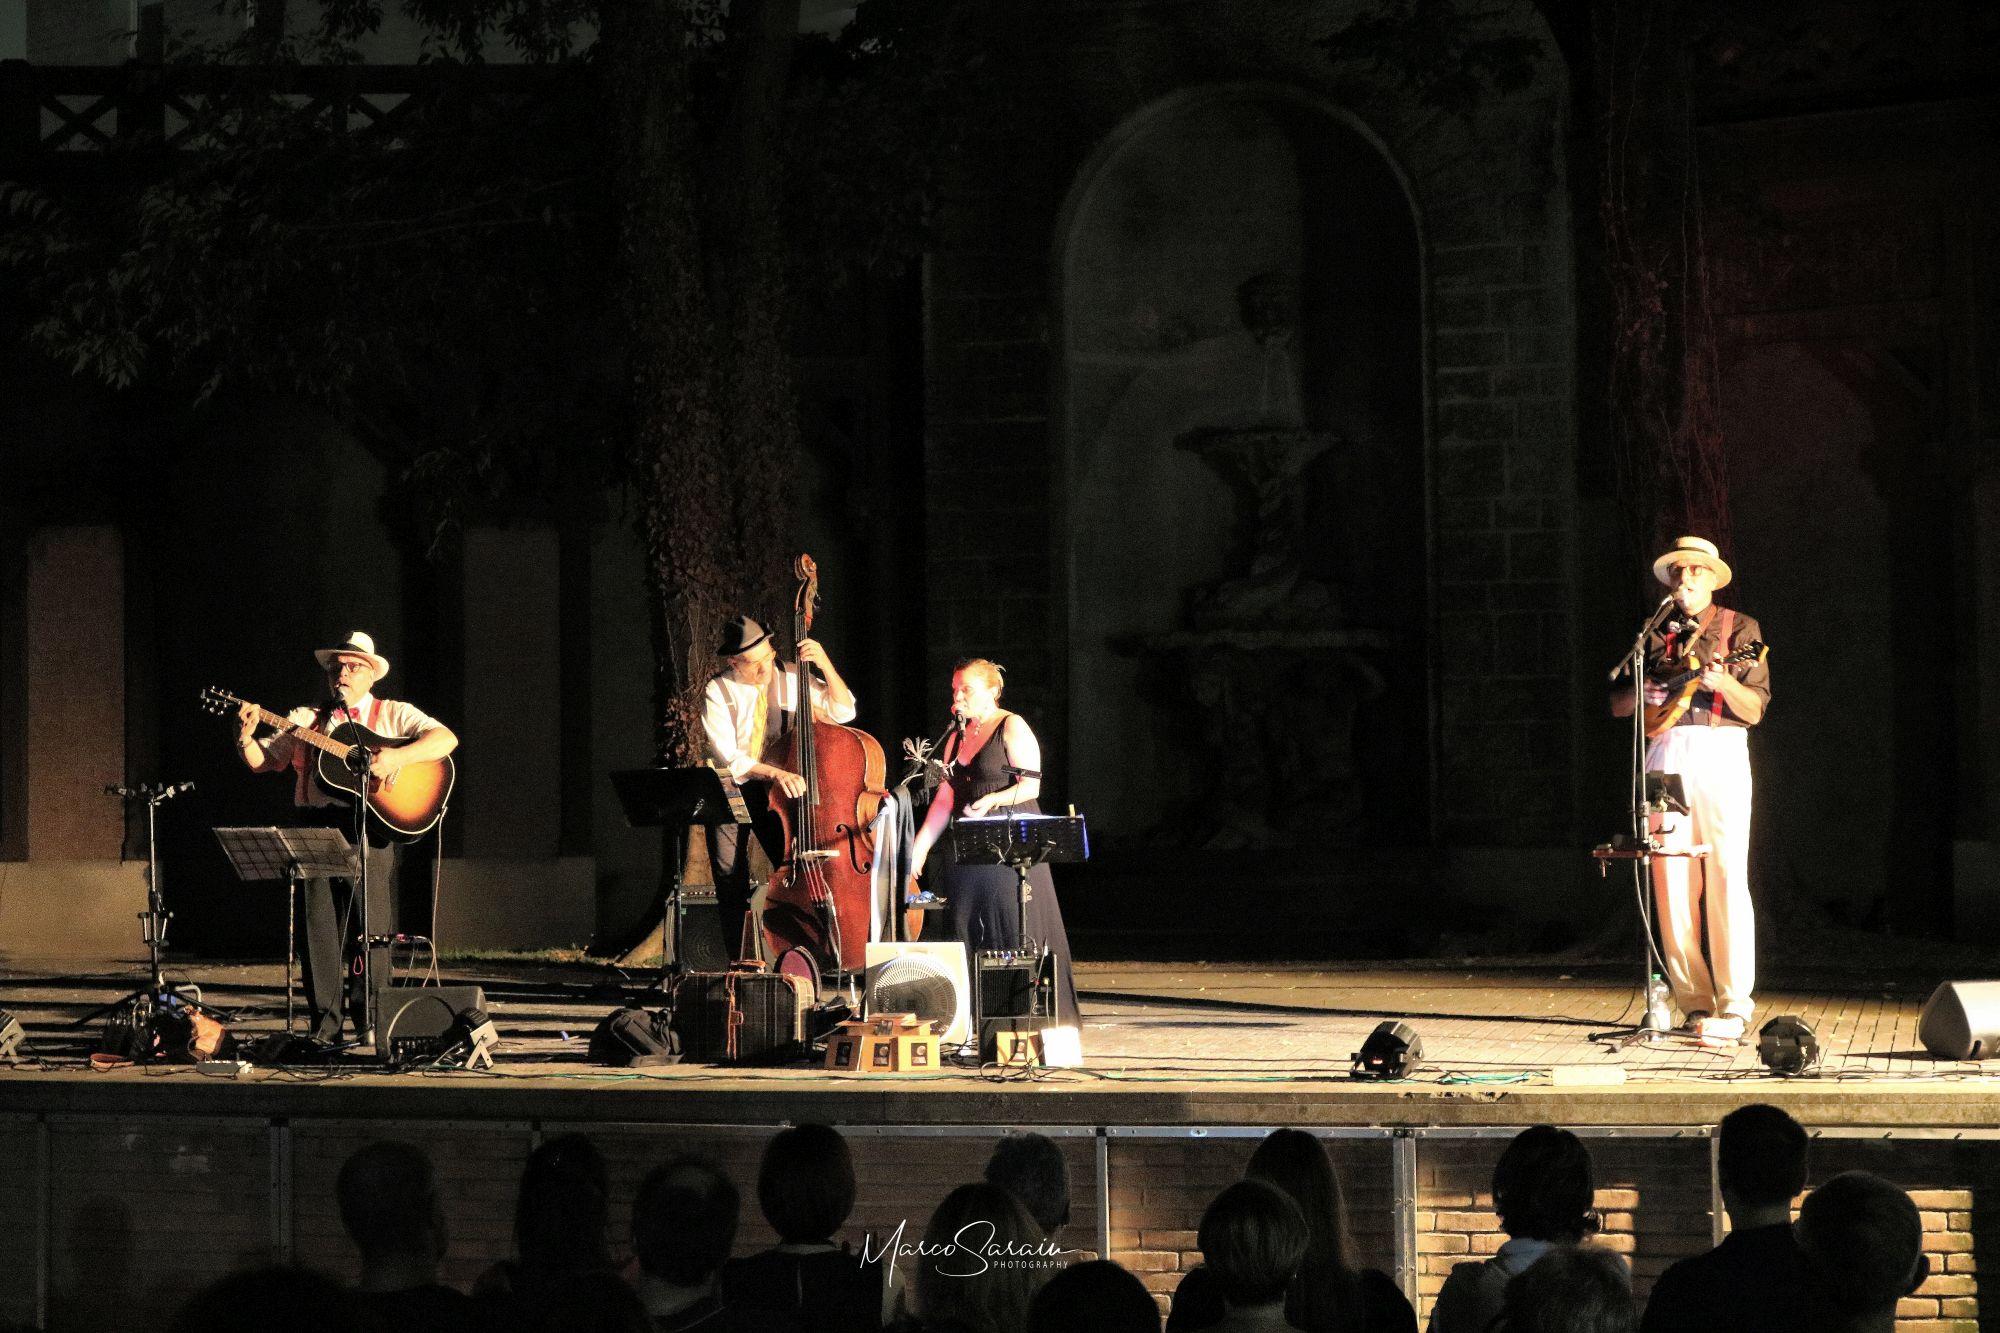 Teatrio' - Palazzo Zuckermann 2019